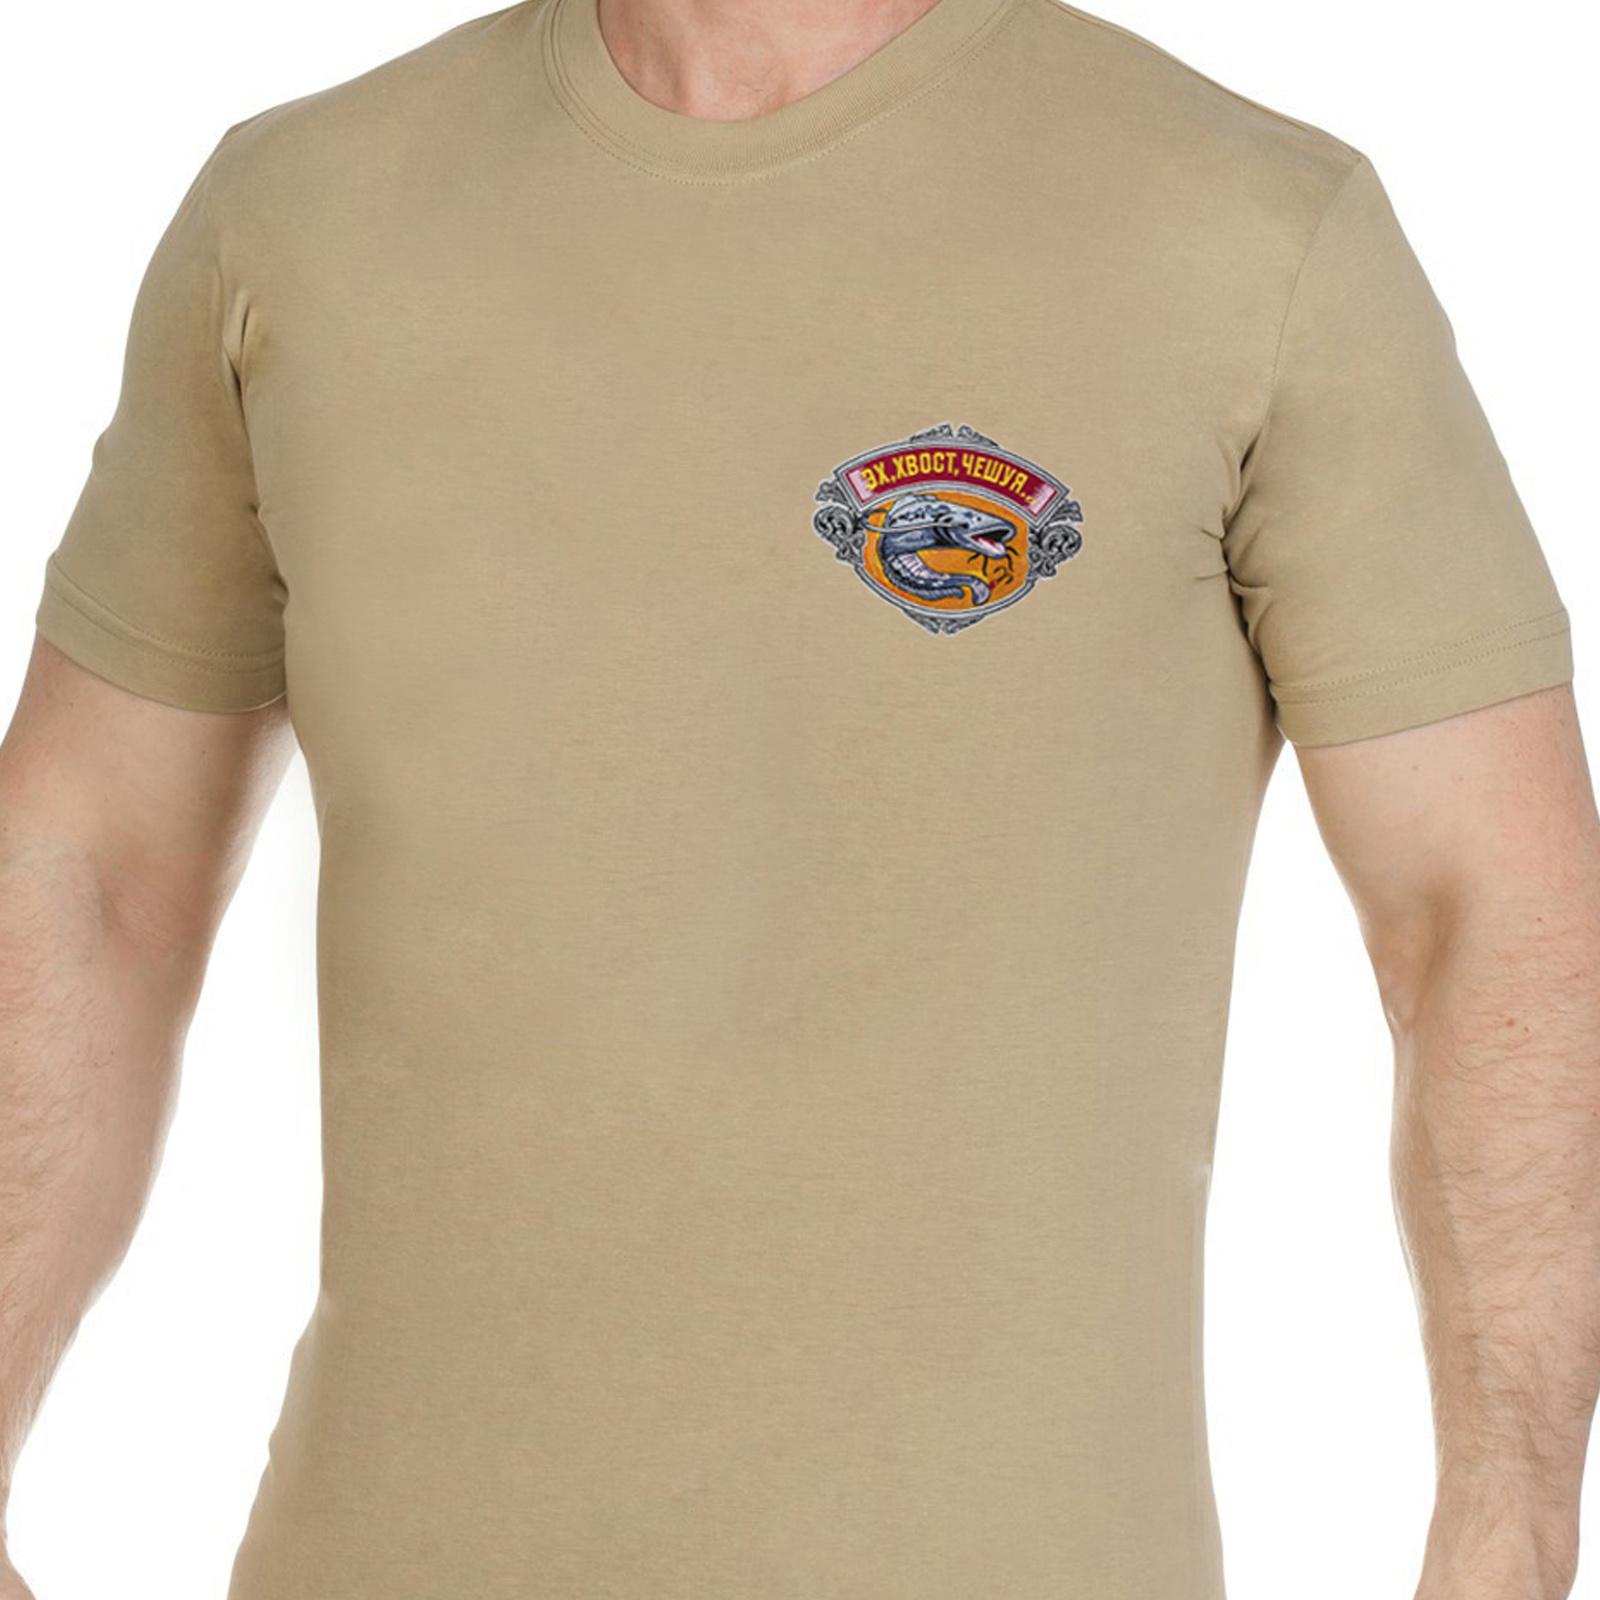 Мужская трикотажная футболка с вышивкой Эх, Хвост, Чешуя